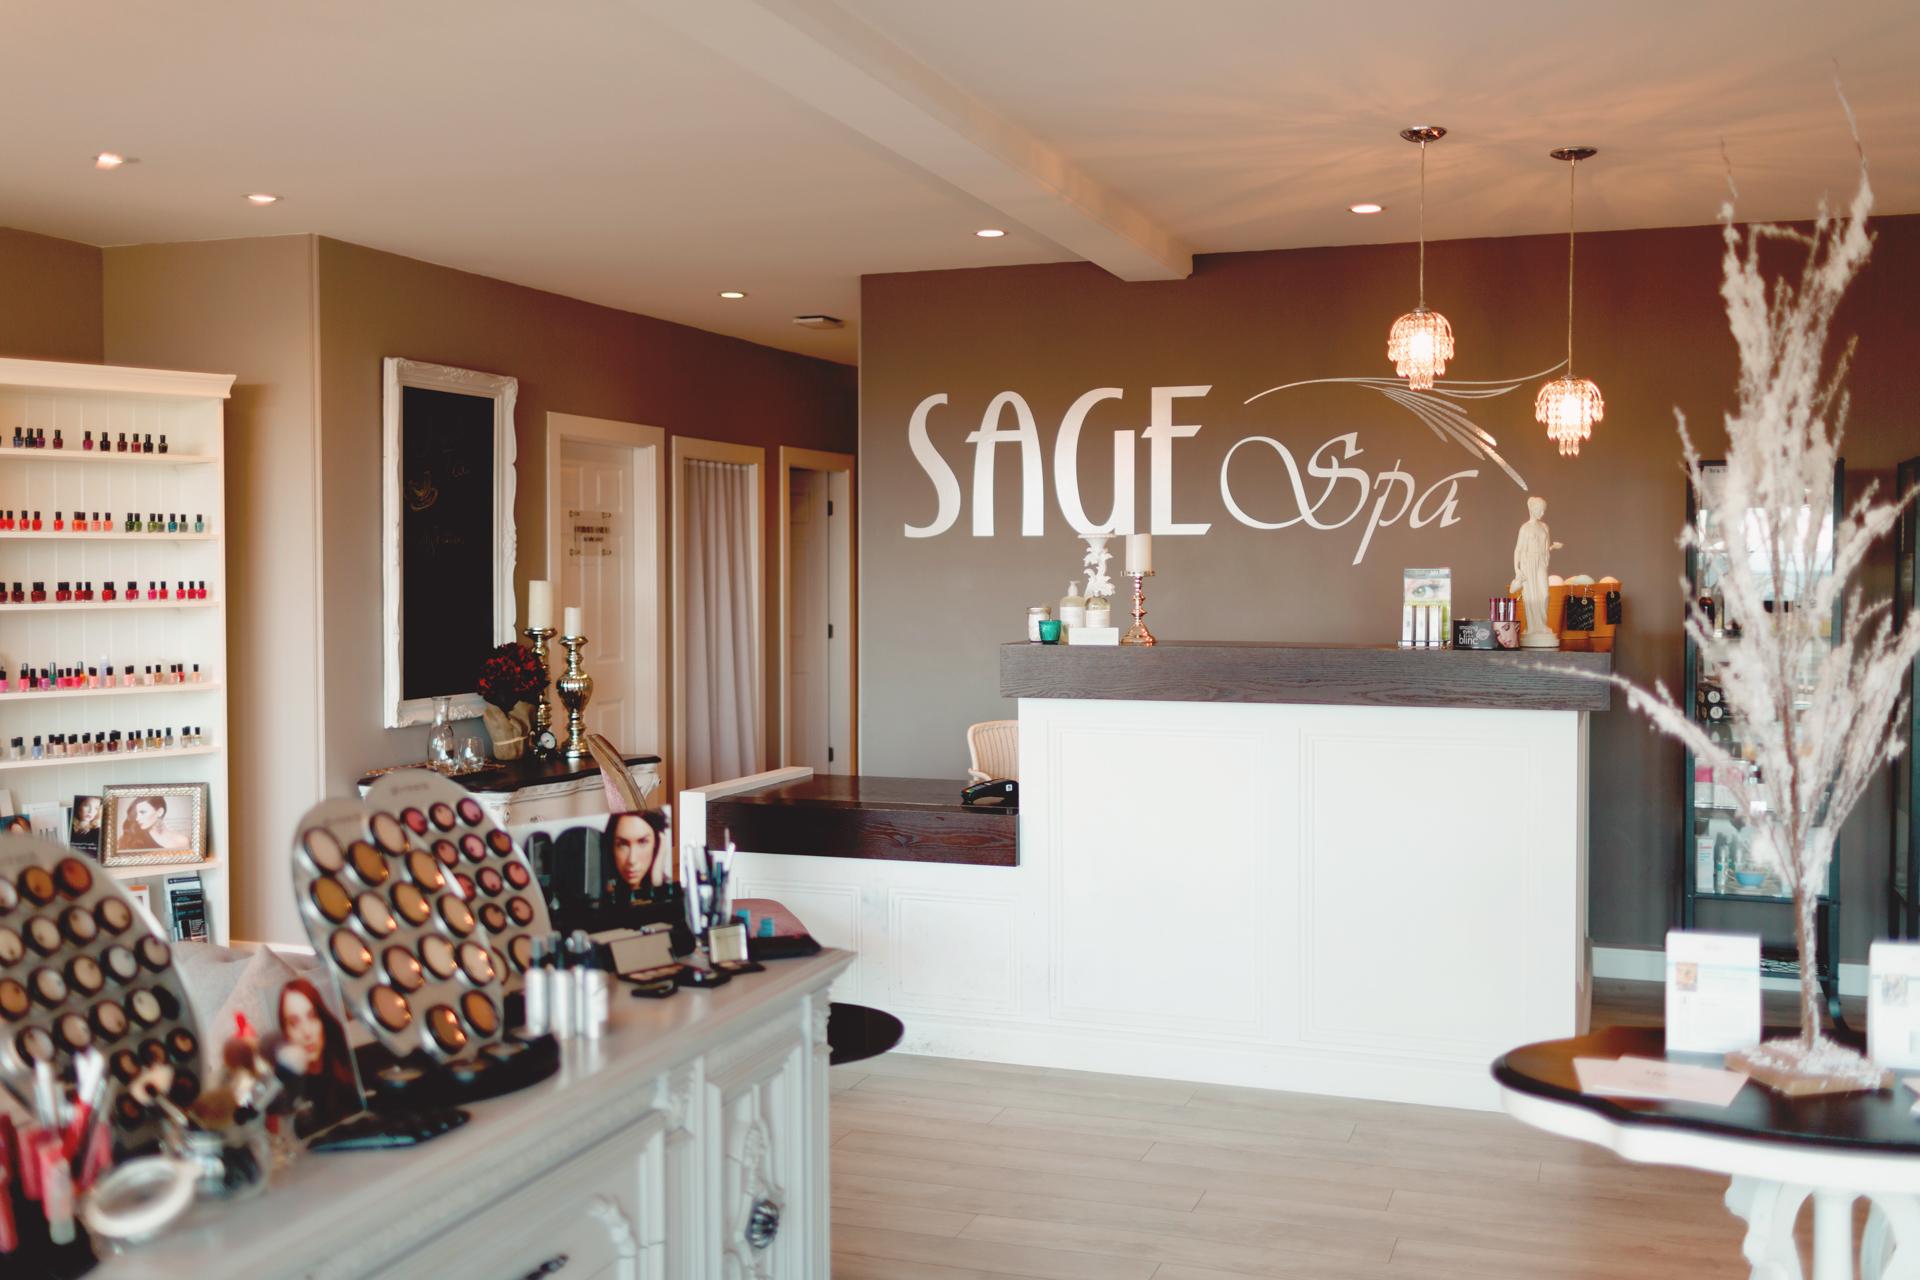 2017-01-29 Sage Spa entry-21.jpg